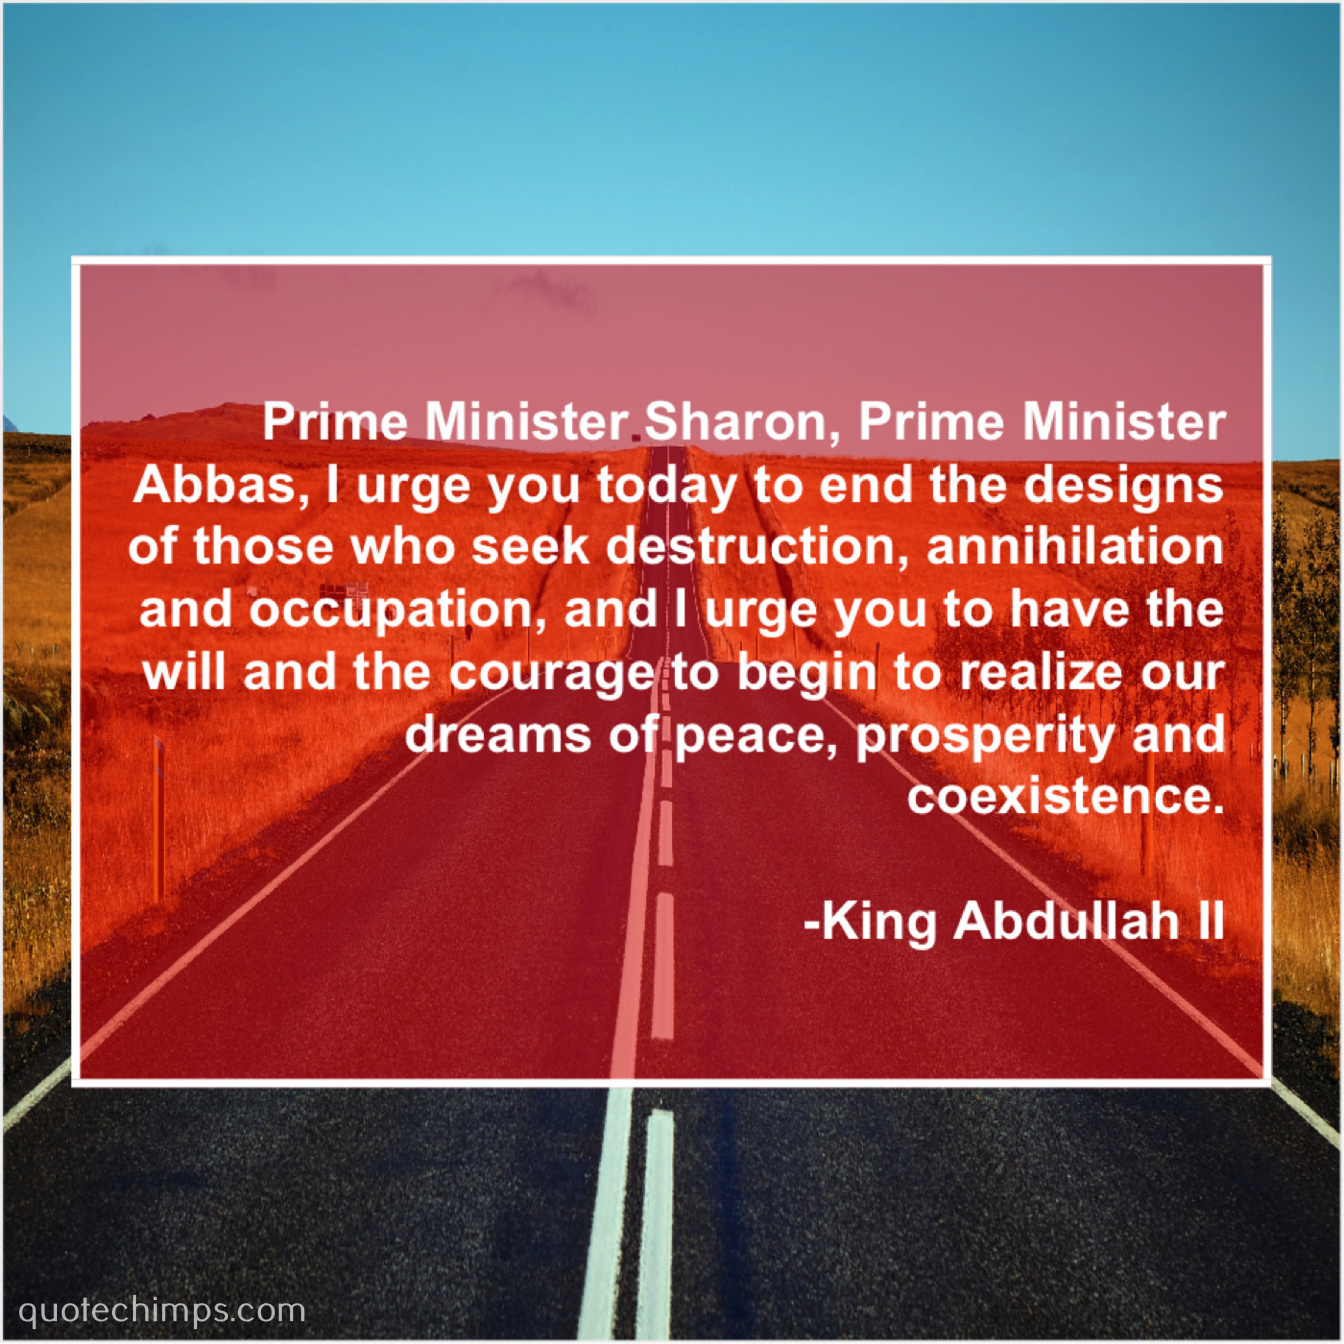 King Abdullah II – Prime Minister Sharon, Prime Minister…  